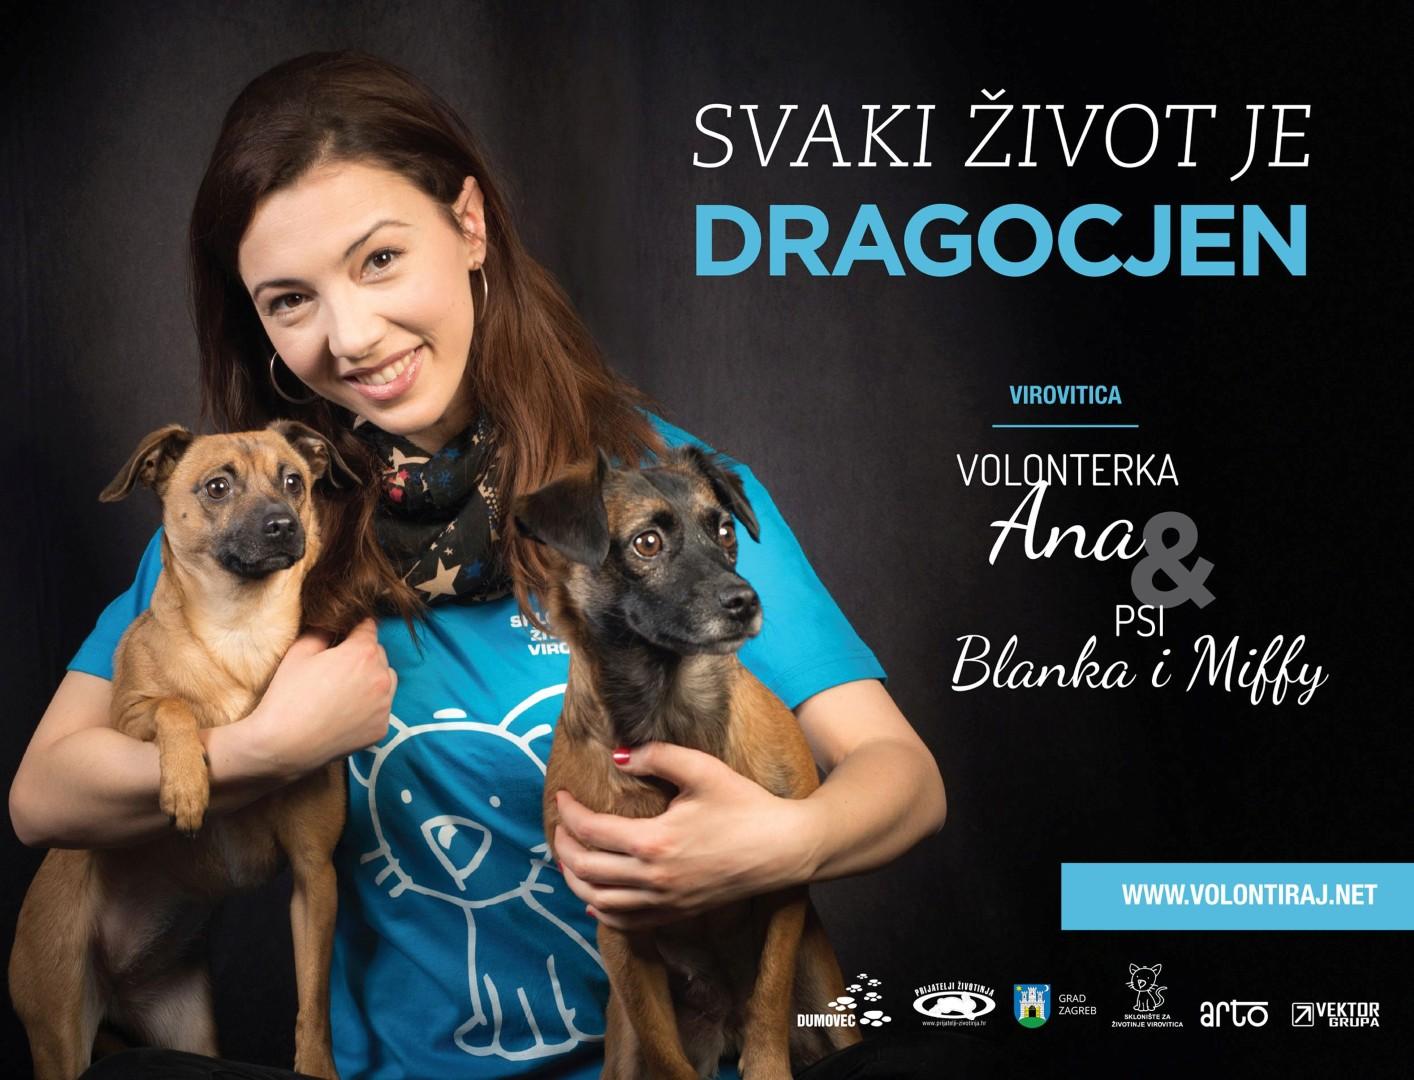 Ana Majhenić afc - 04/28/15 each life is precious!